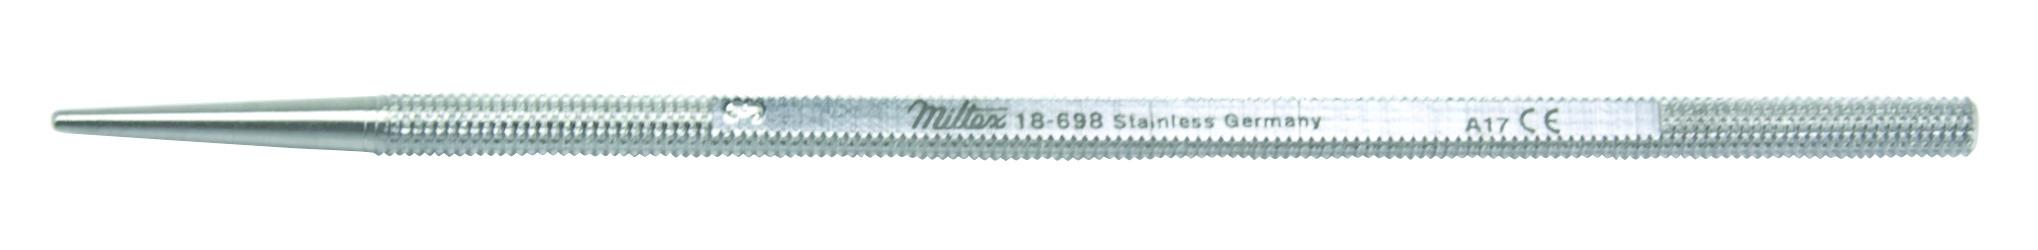 wilder-lacrimal-dilator-4-102-cm-short-taper-18-698-miltex.jpg